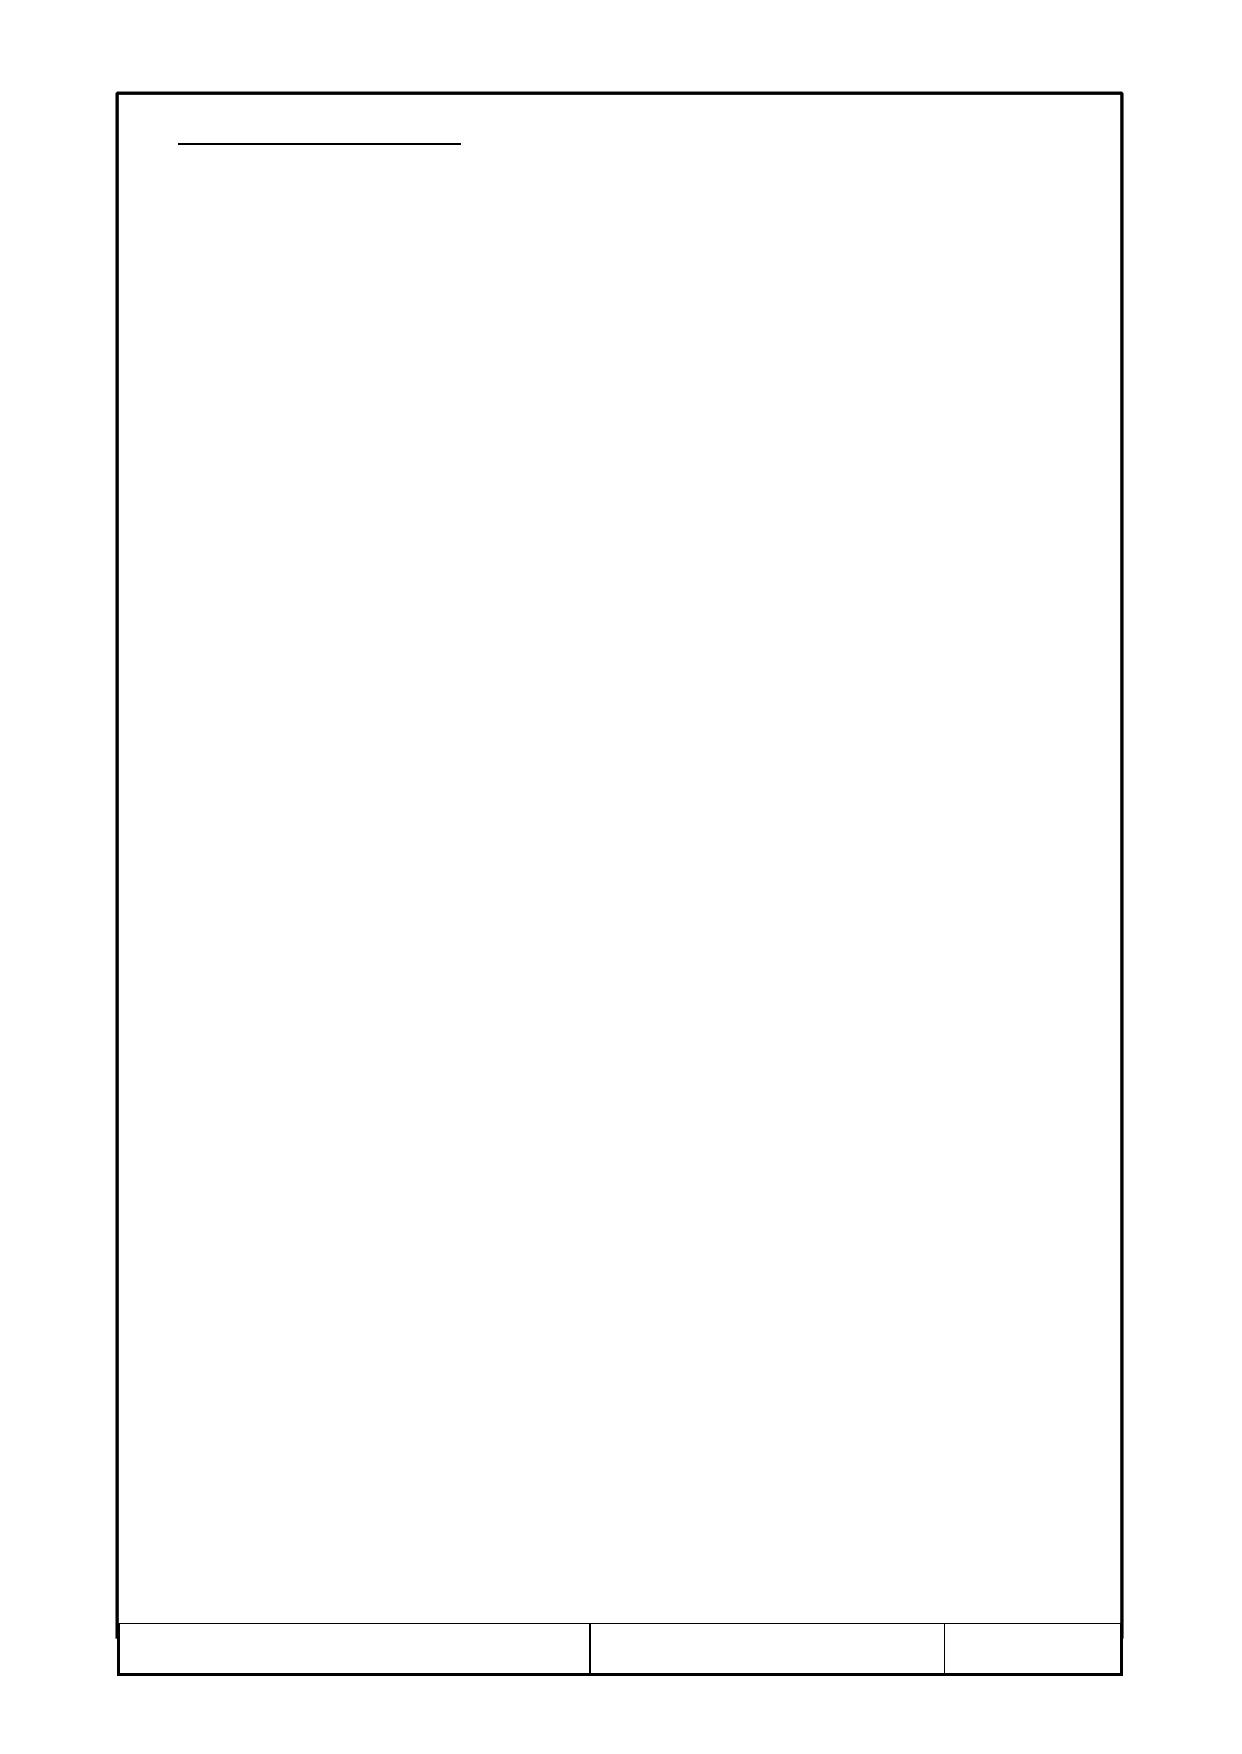 F-51405GNB-LW-AJ Даташит, Описание, Даташиты